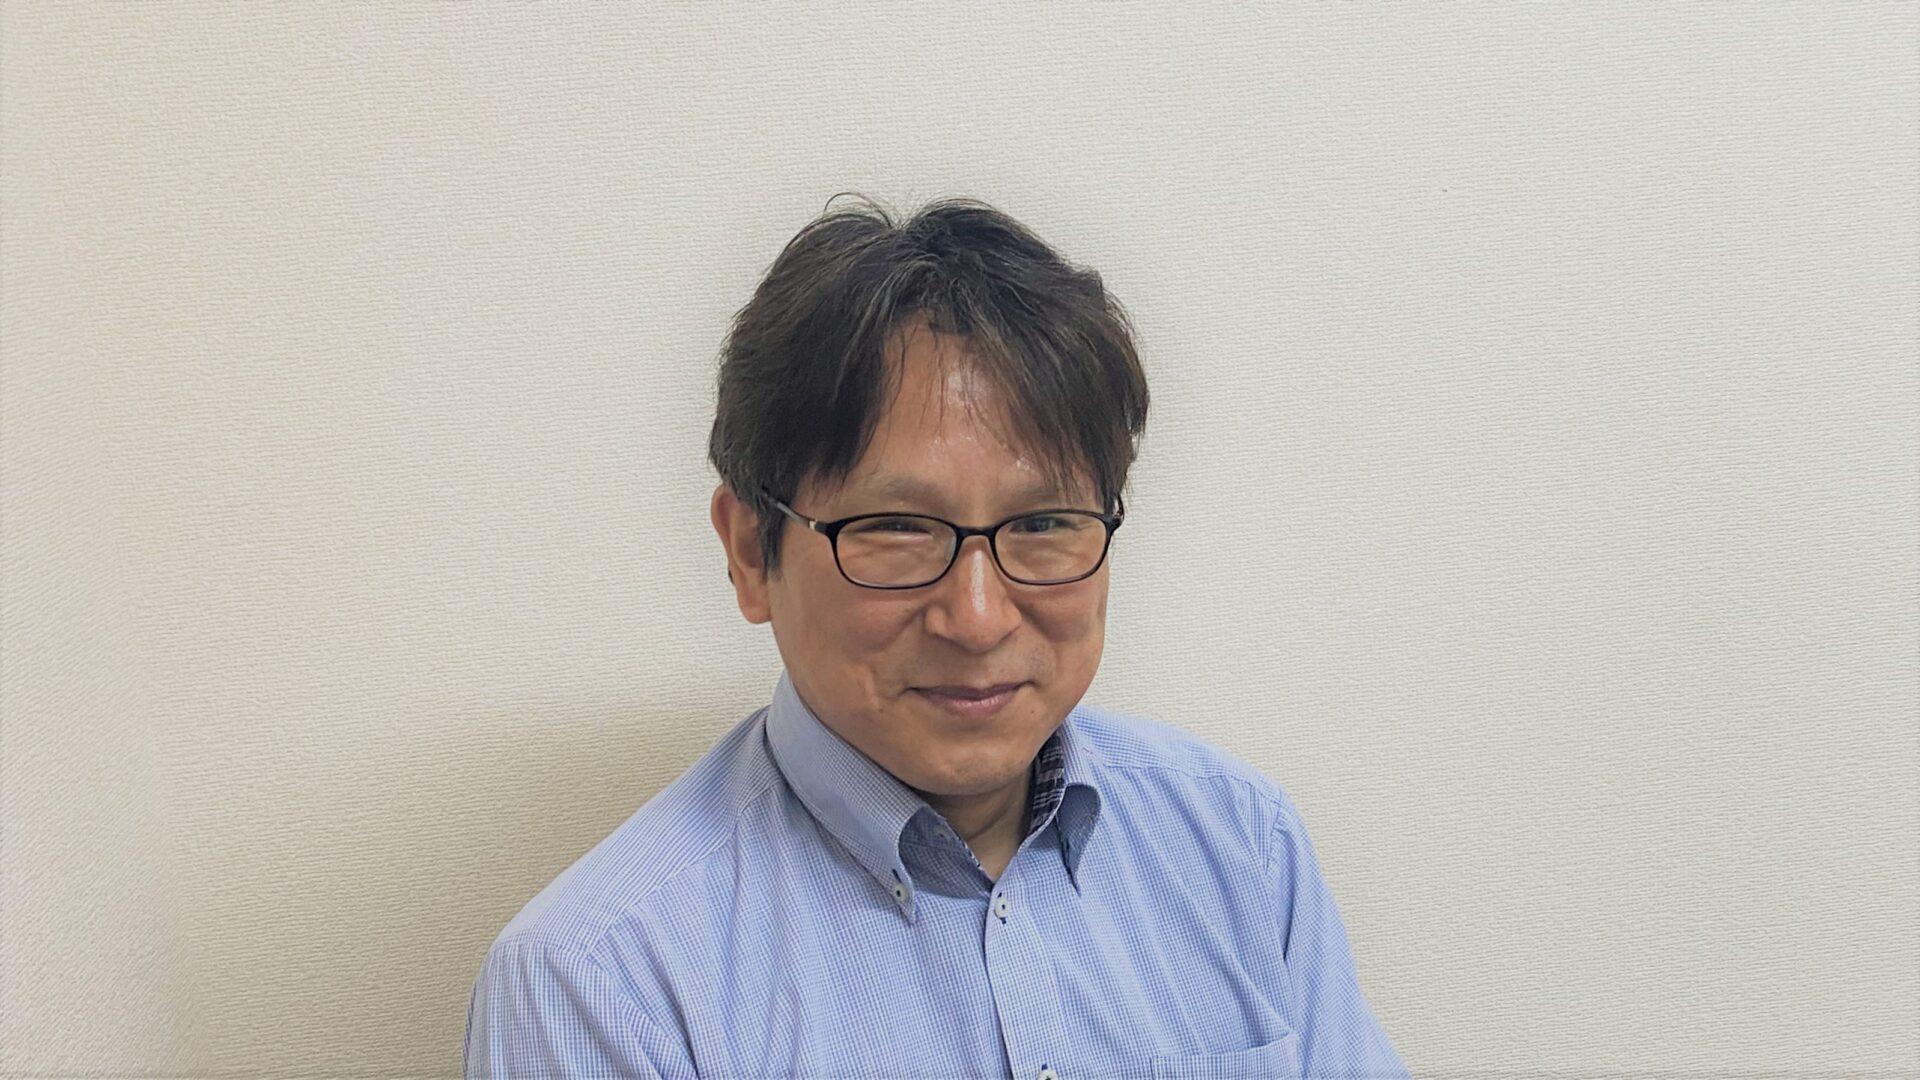 日本相続対策研究所 所長本間文也氏本社にて